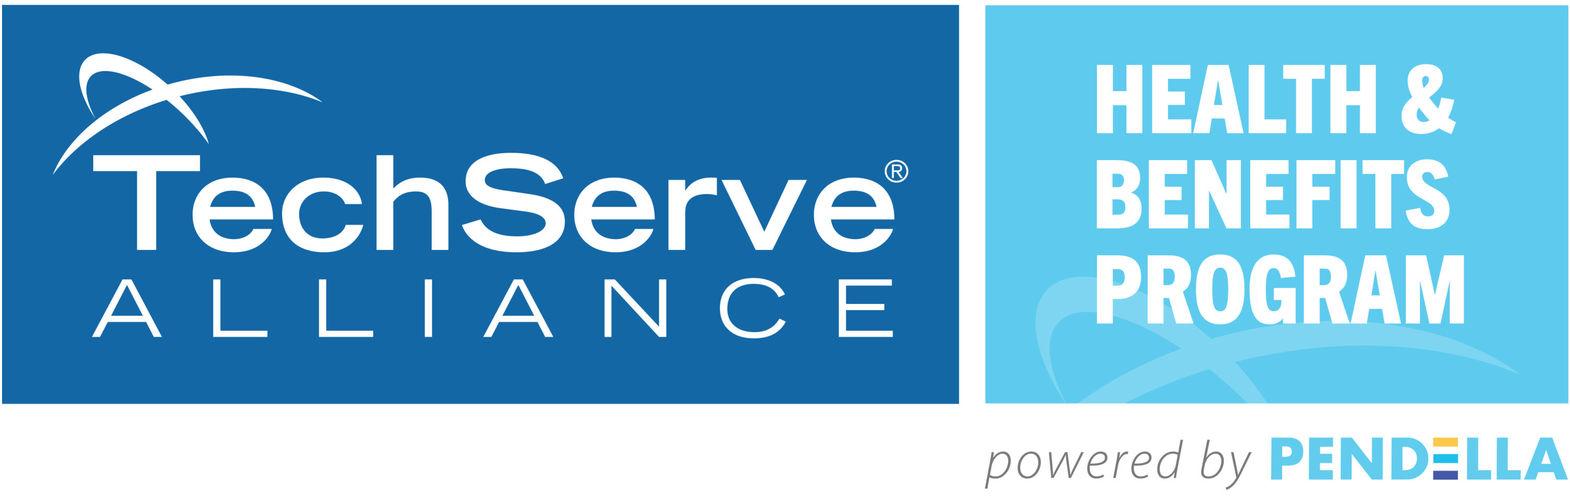 TechServe Alliance Health & Benefits Program